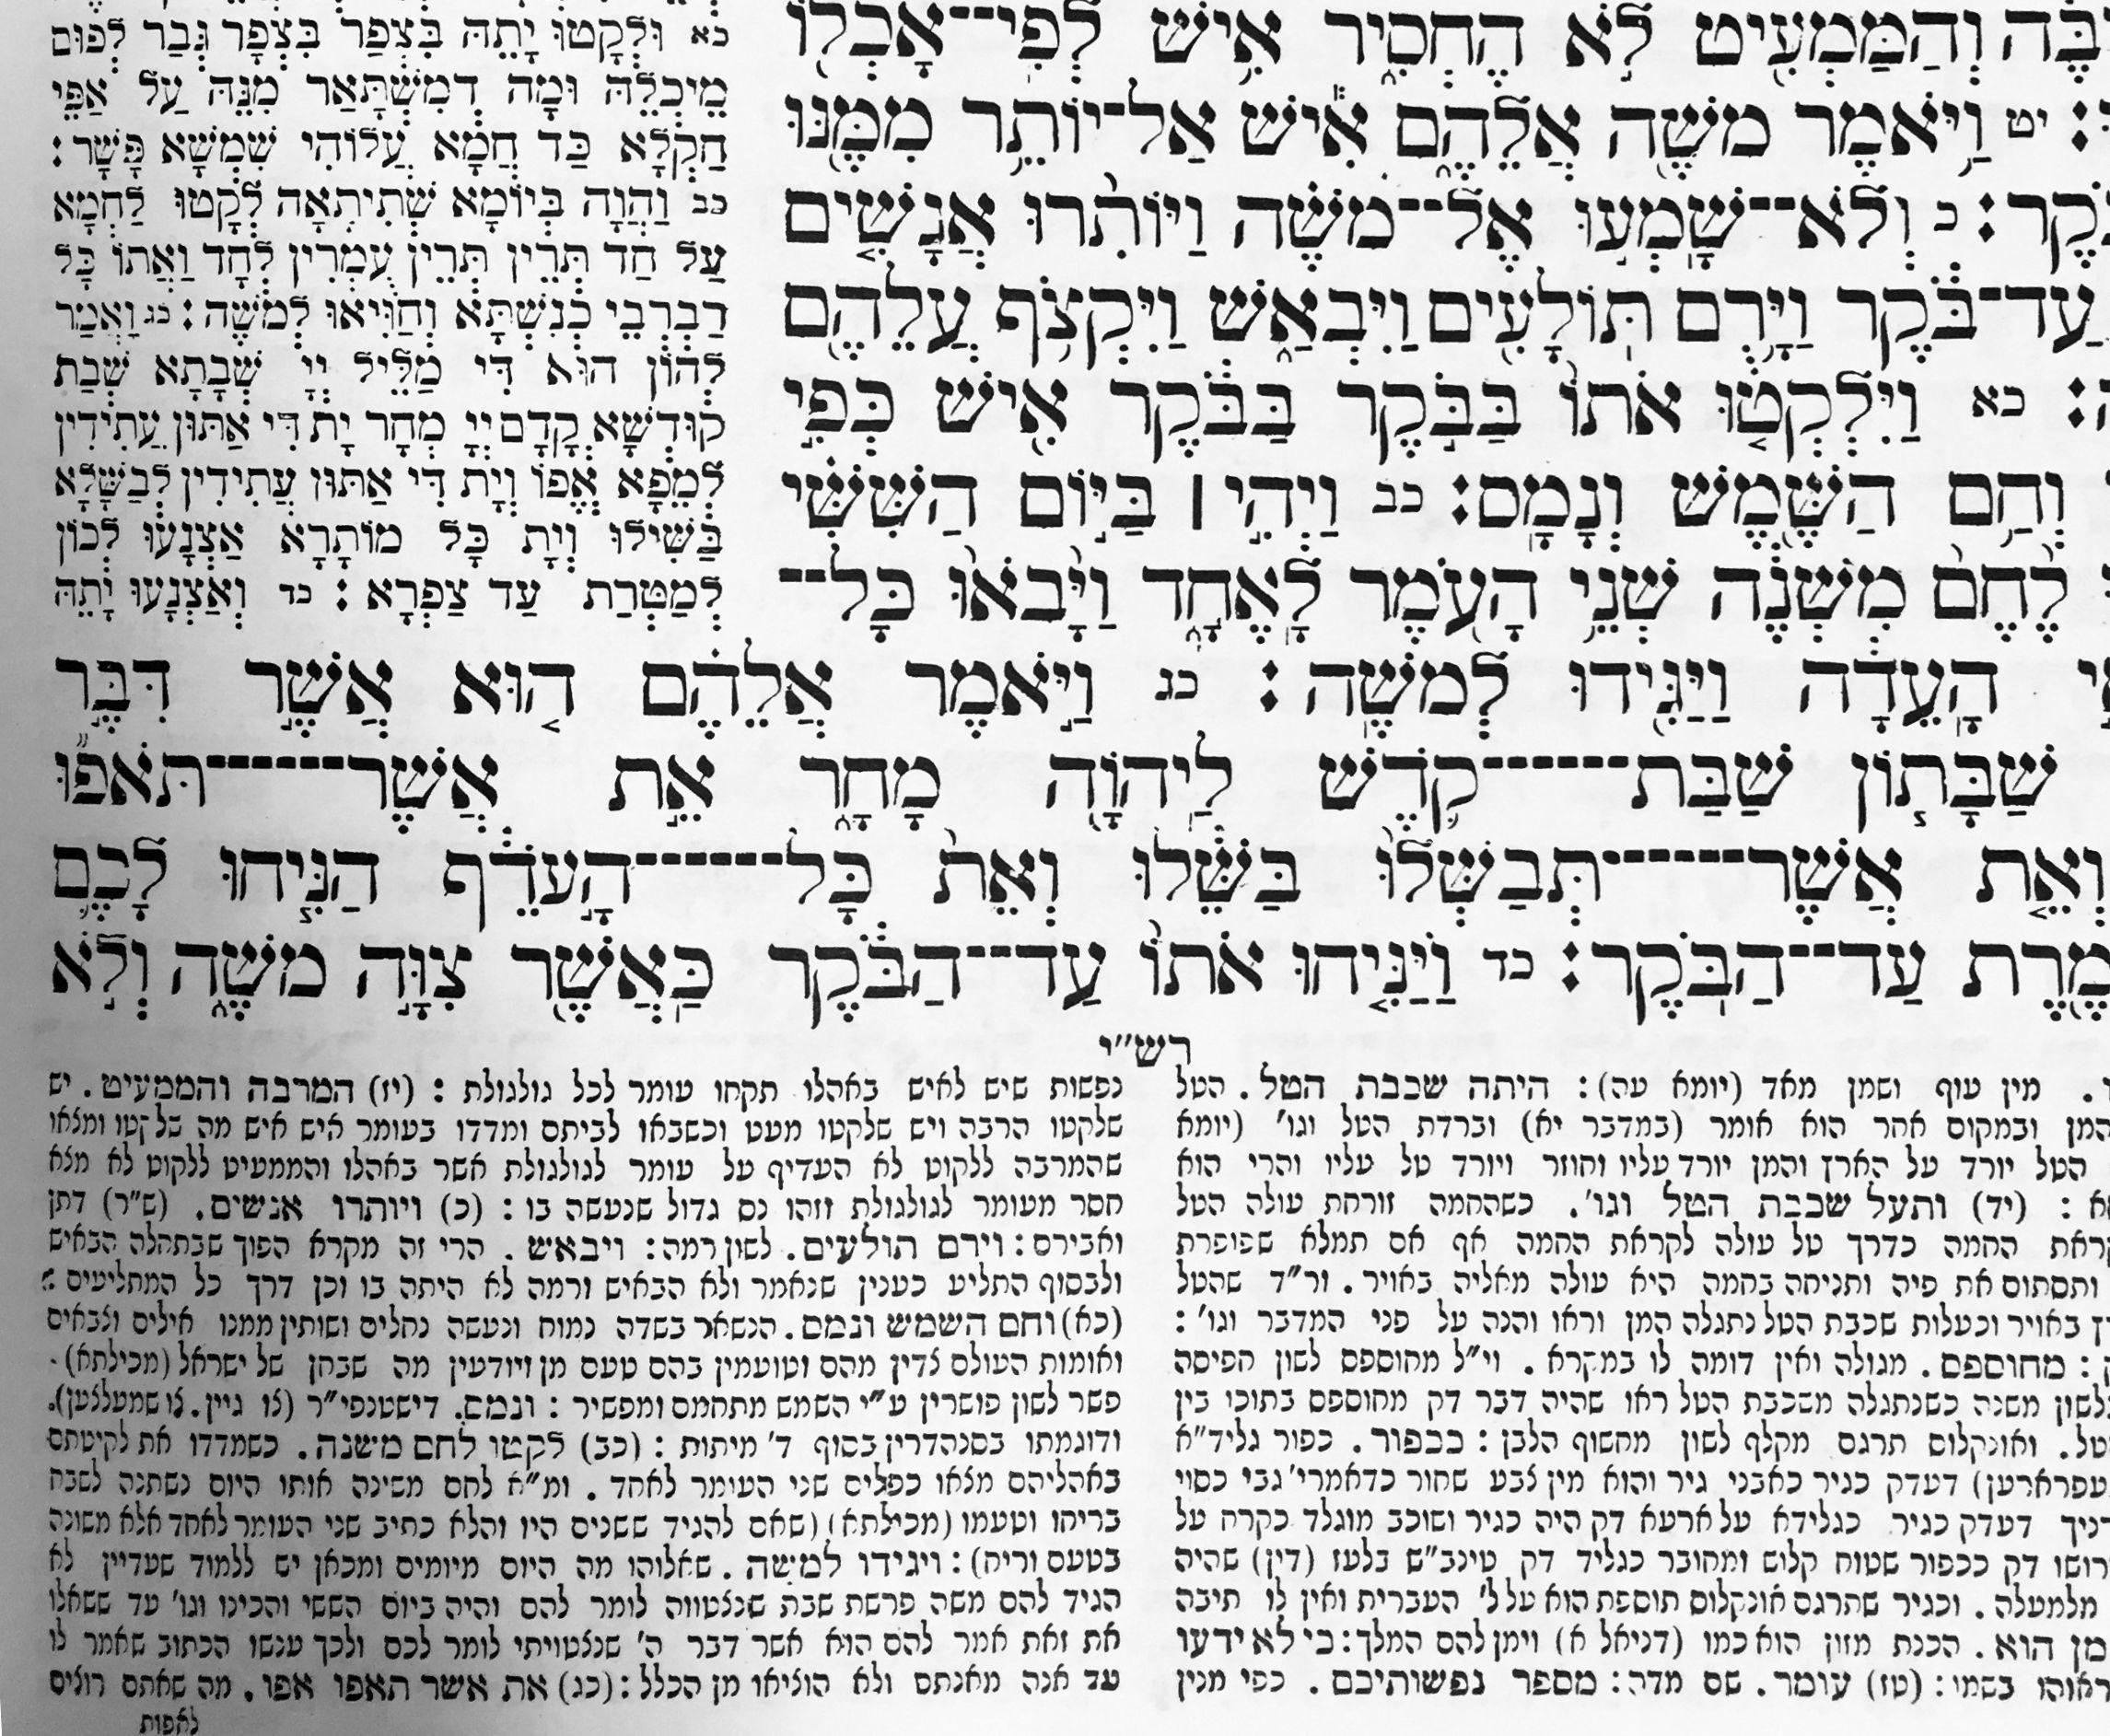 Extra dashes used to justify loose lines. (Chumash) Kolel Hamishah Humshe Torah. Published by Ziegelheim, New York, 1979 cc @baruchgorkin